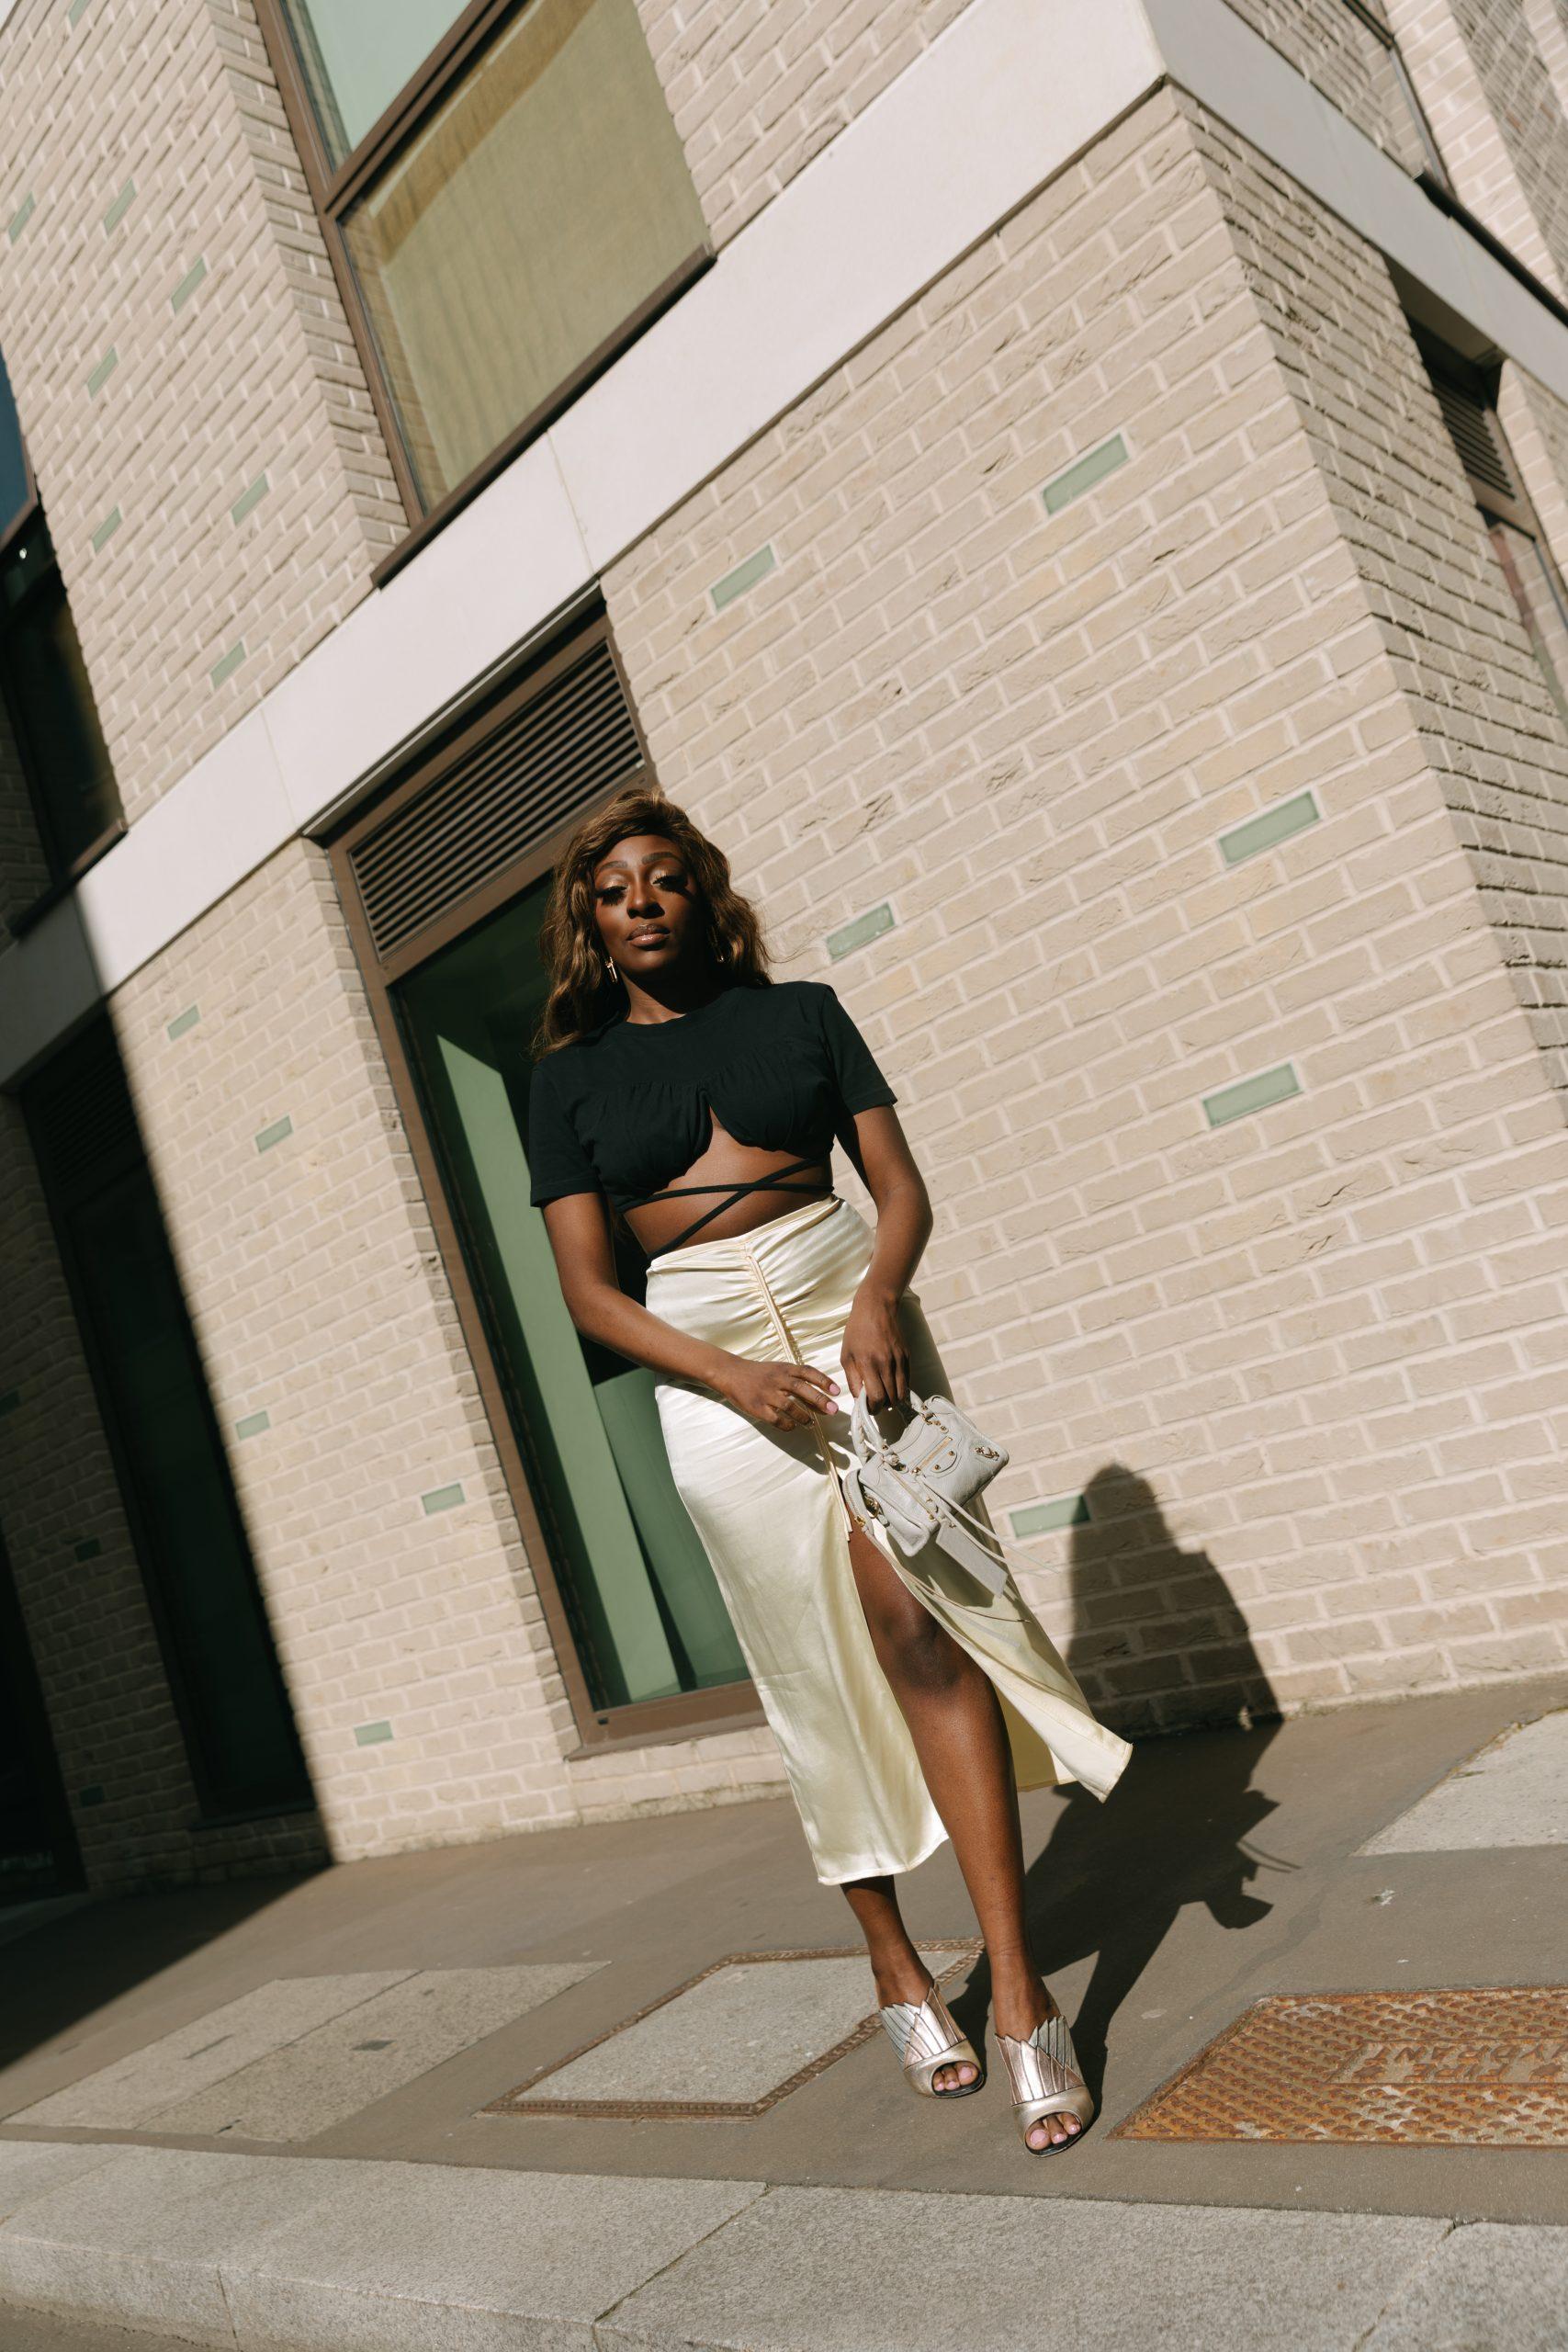 Jacquemus T-Shirt and Crop Top - Zara Satin midi skirt - Tasha Antwi